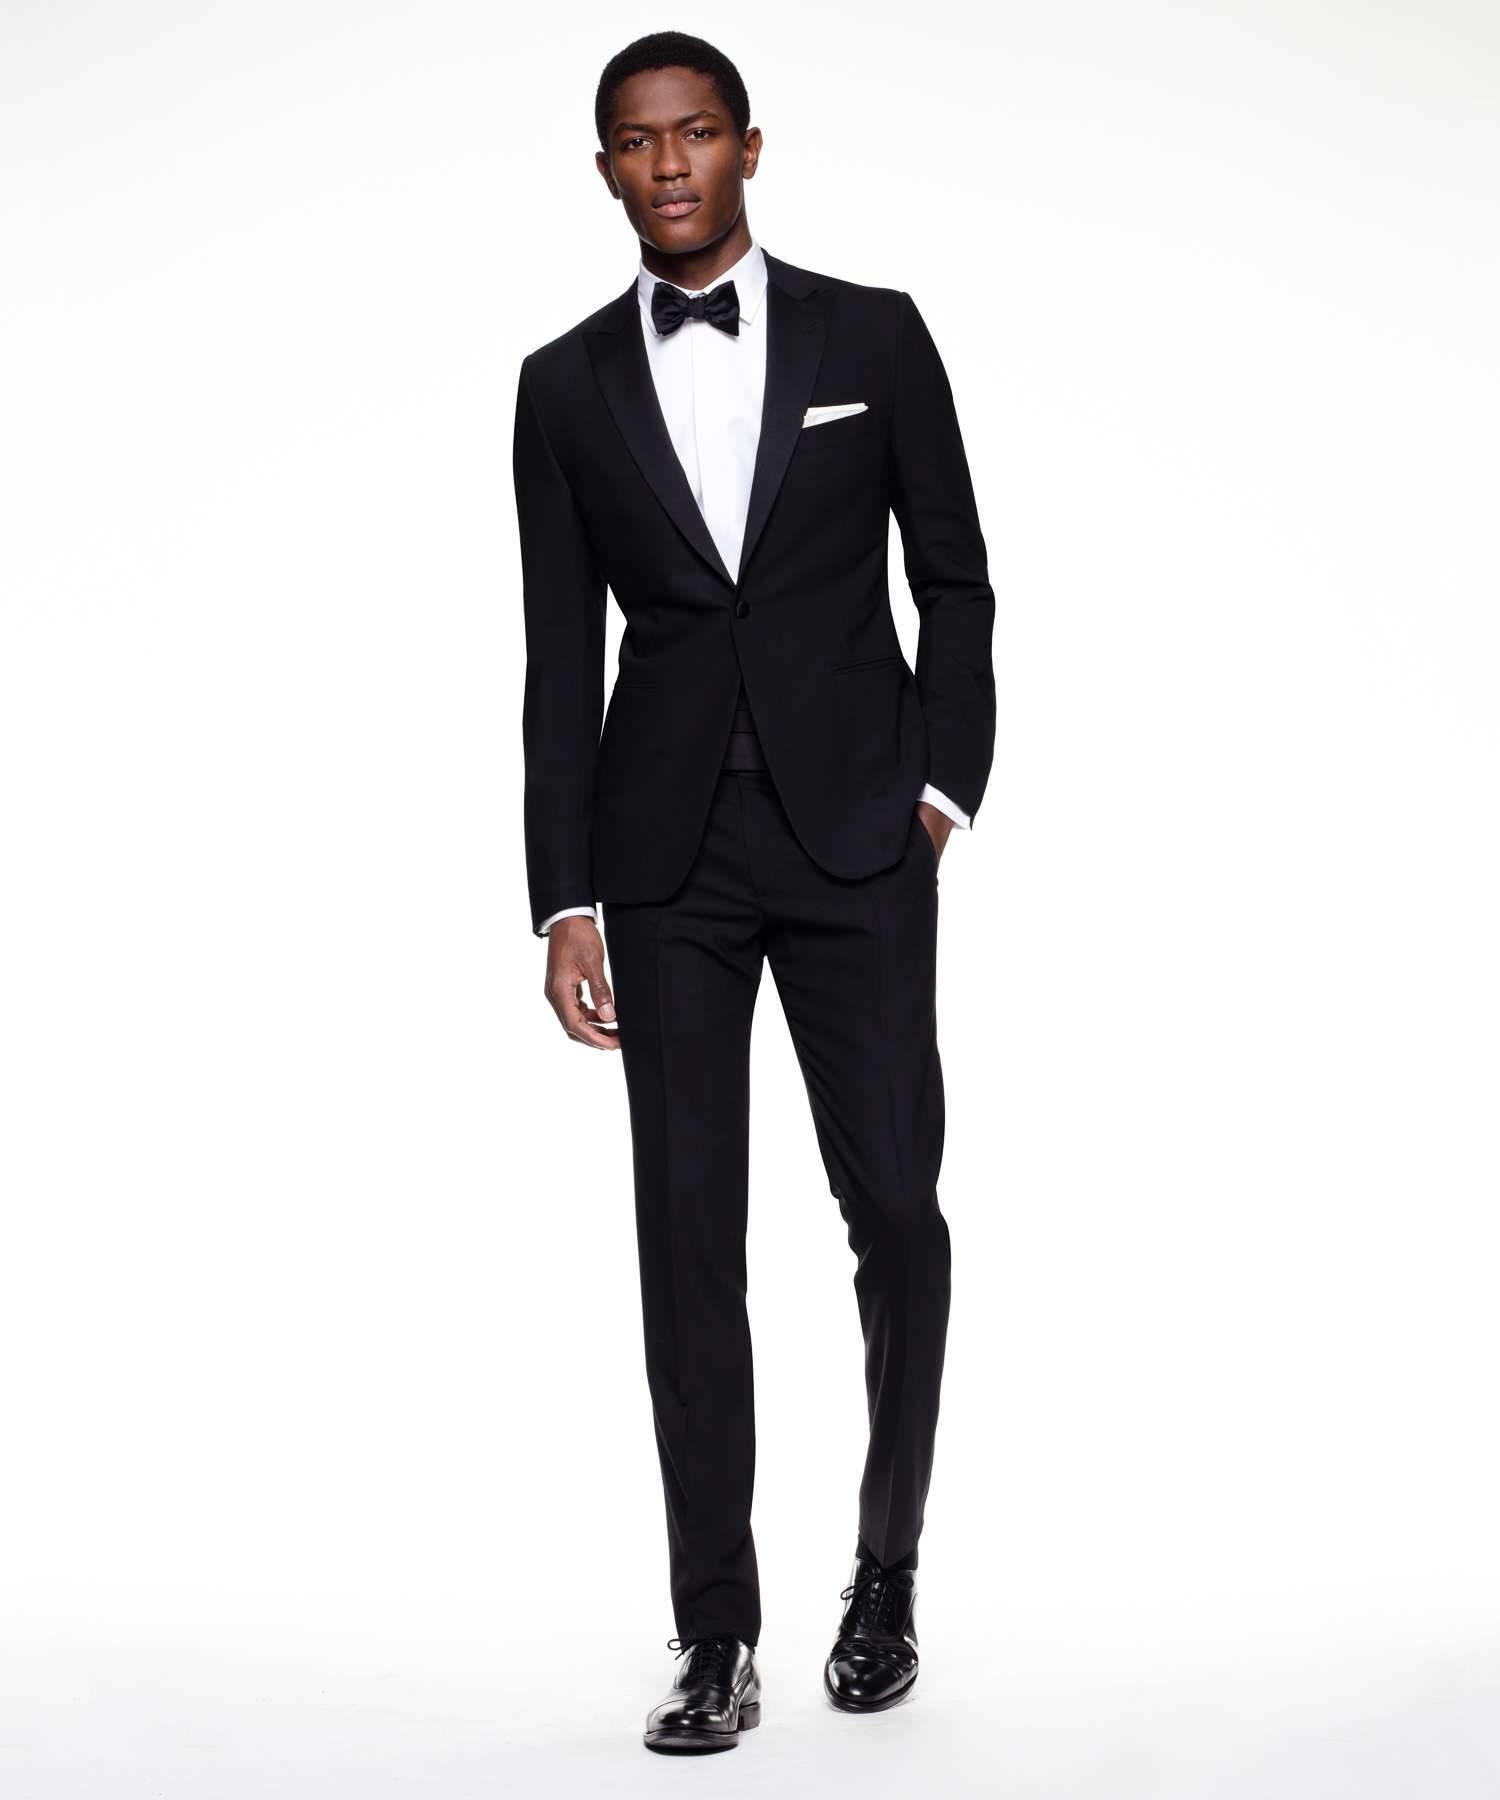 Tailored tuxedos